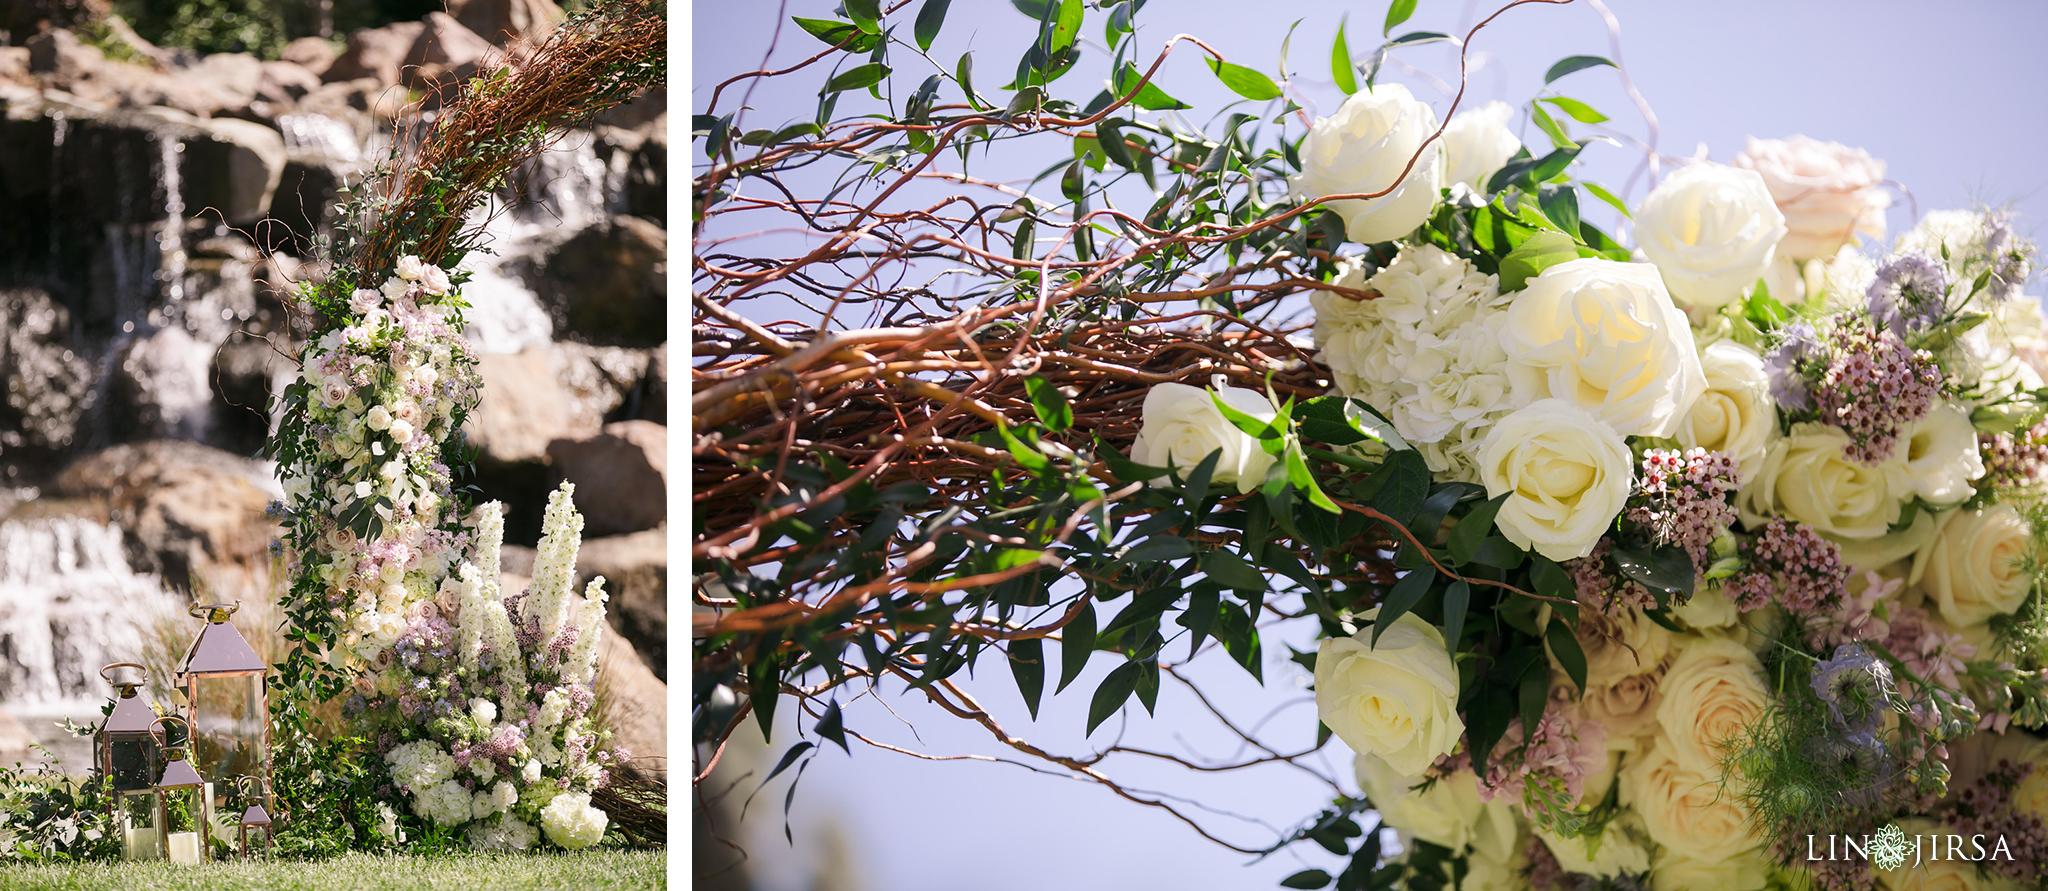 13 Four Seasons Westlake Village Indian Wedding Photographer